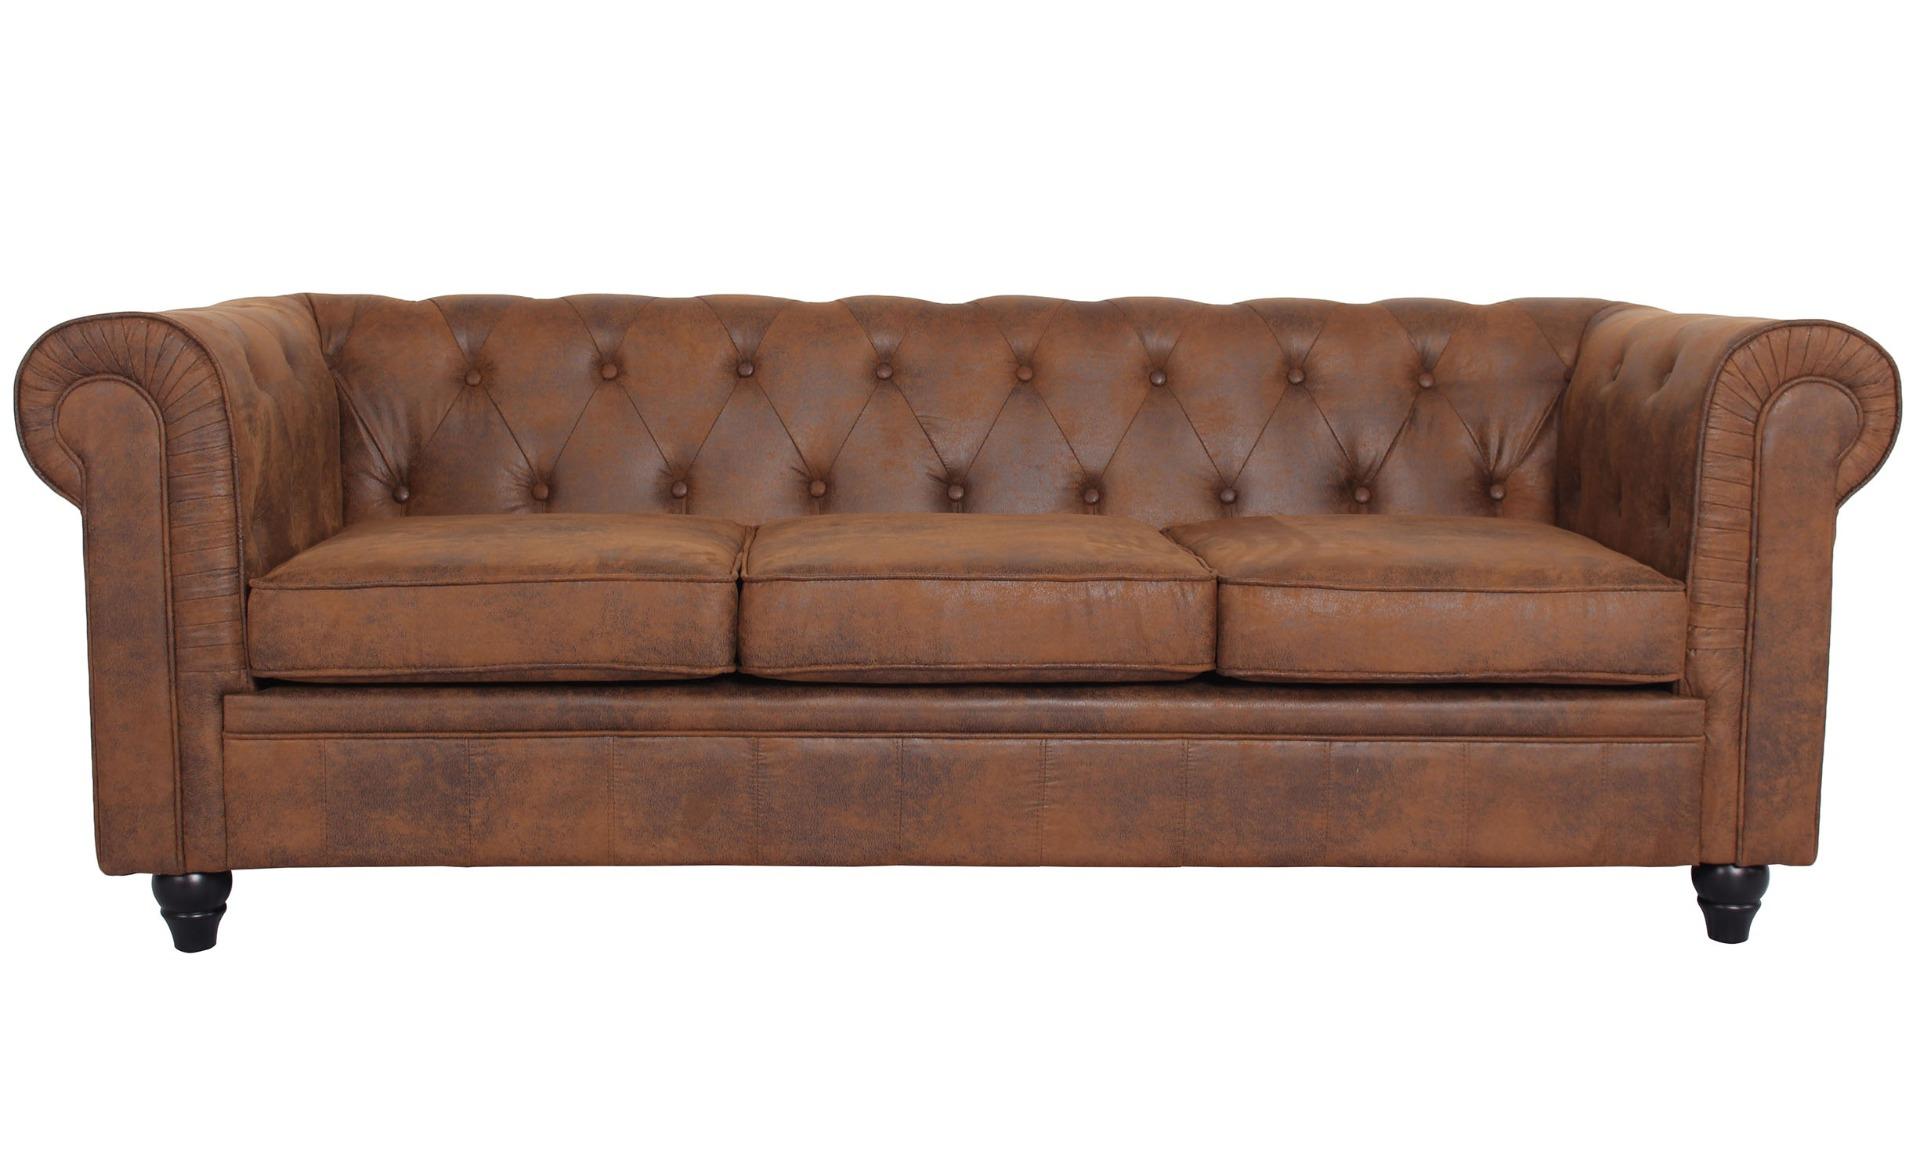 Grand canapé 3 places Chesterfield Vintage